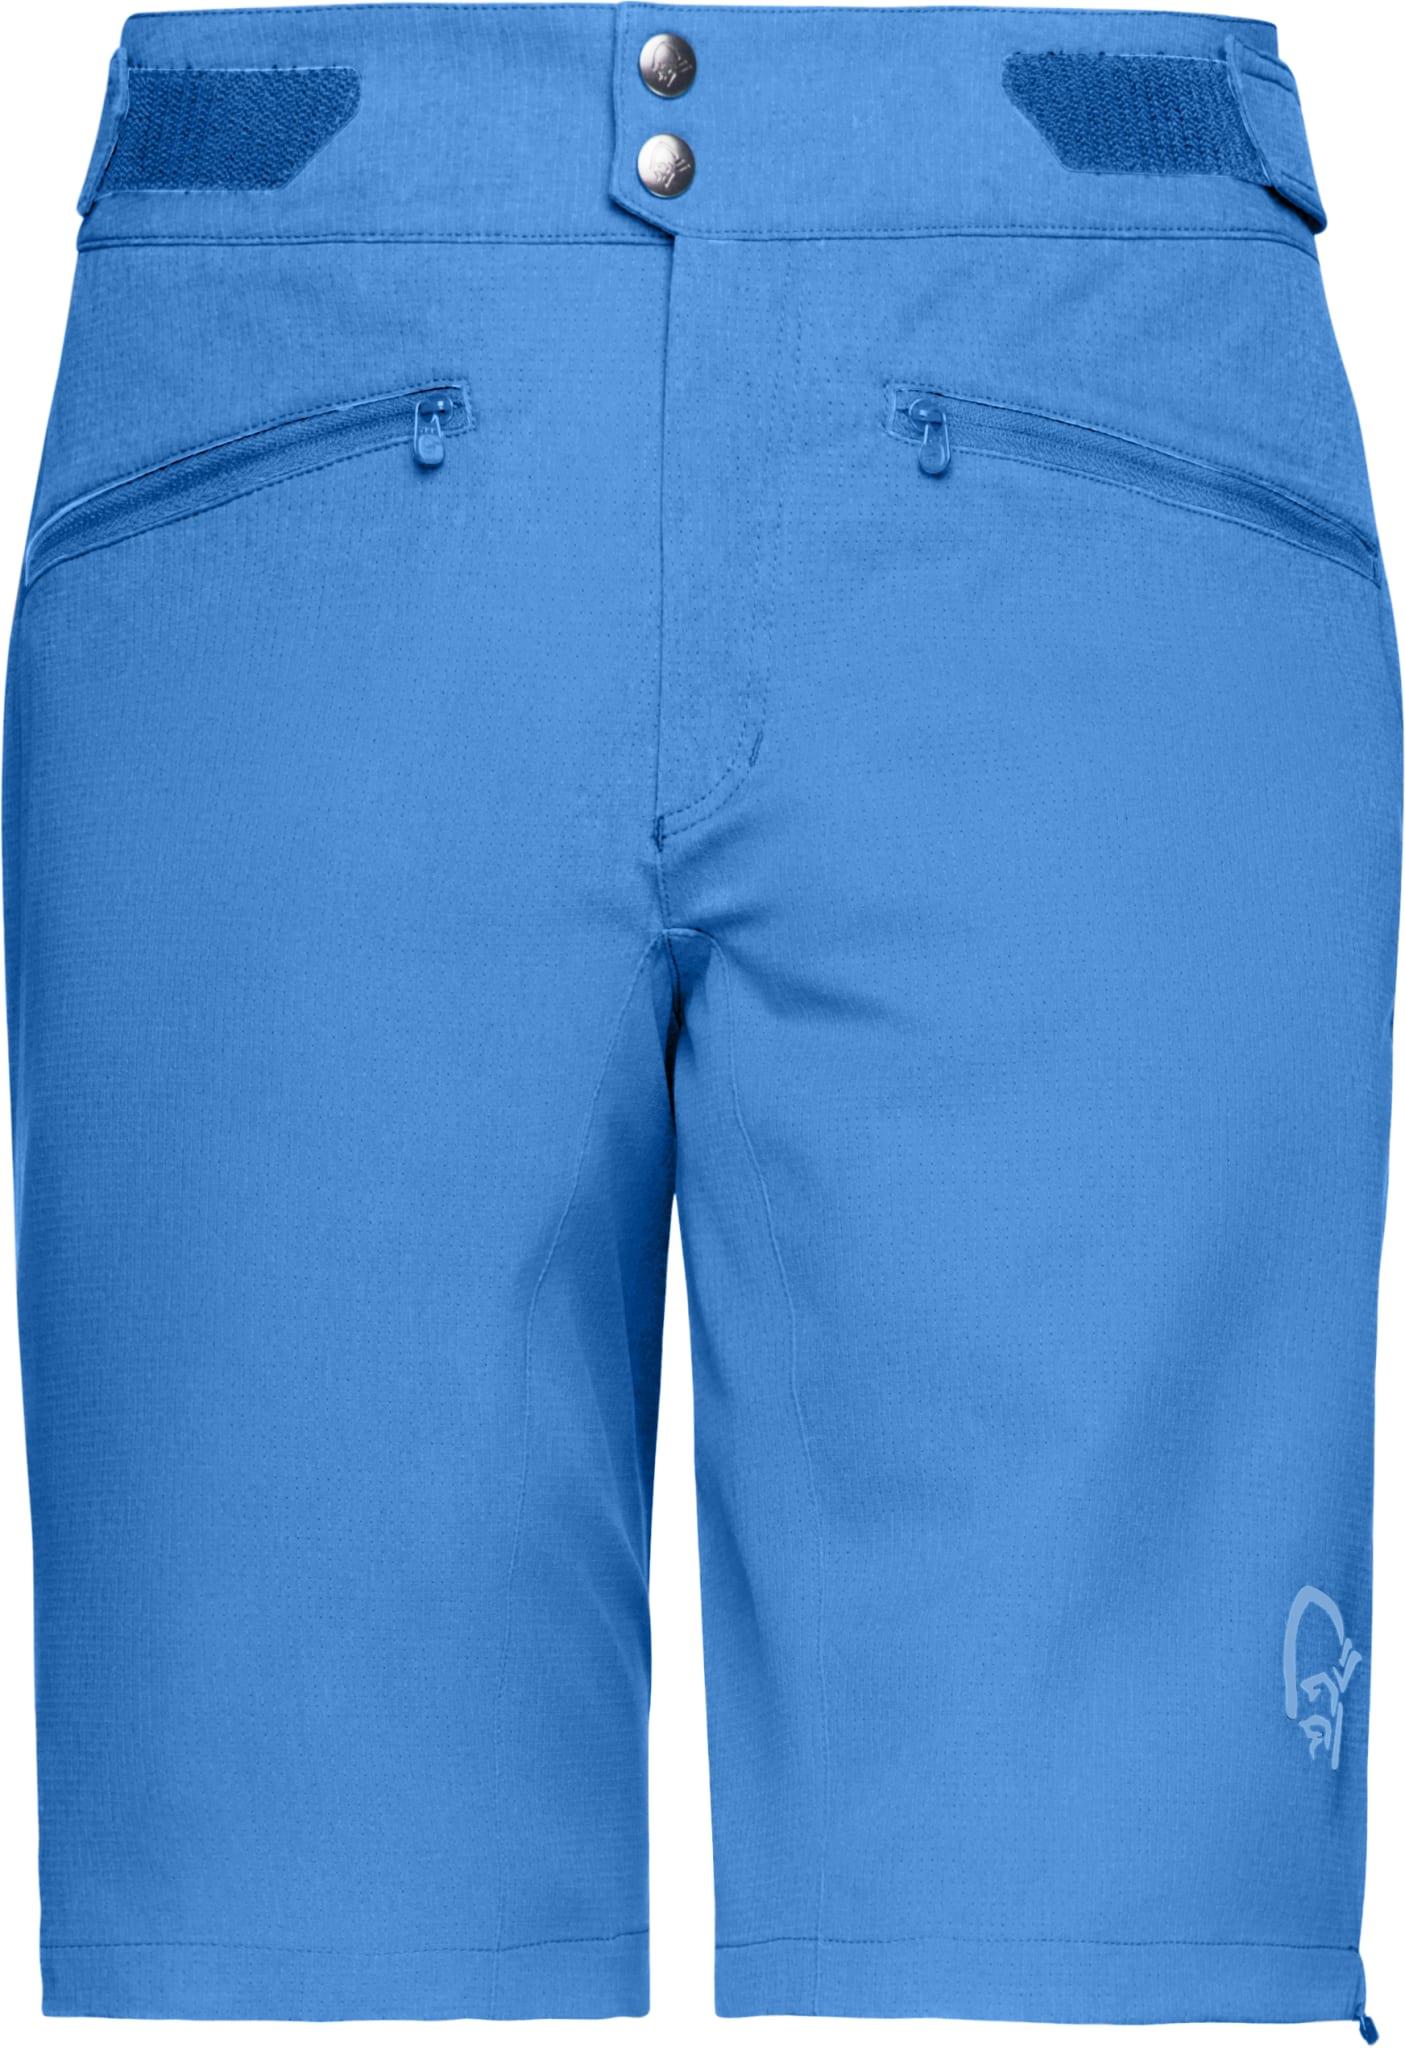 Fjørå Flex1 Lightweight Shorts W